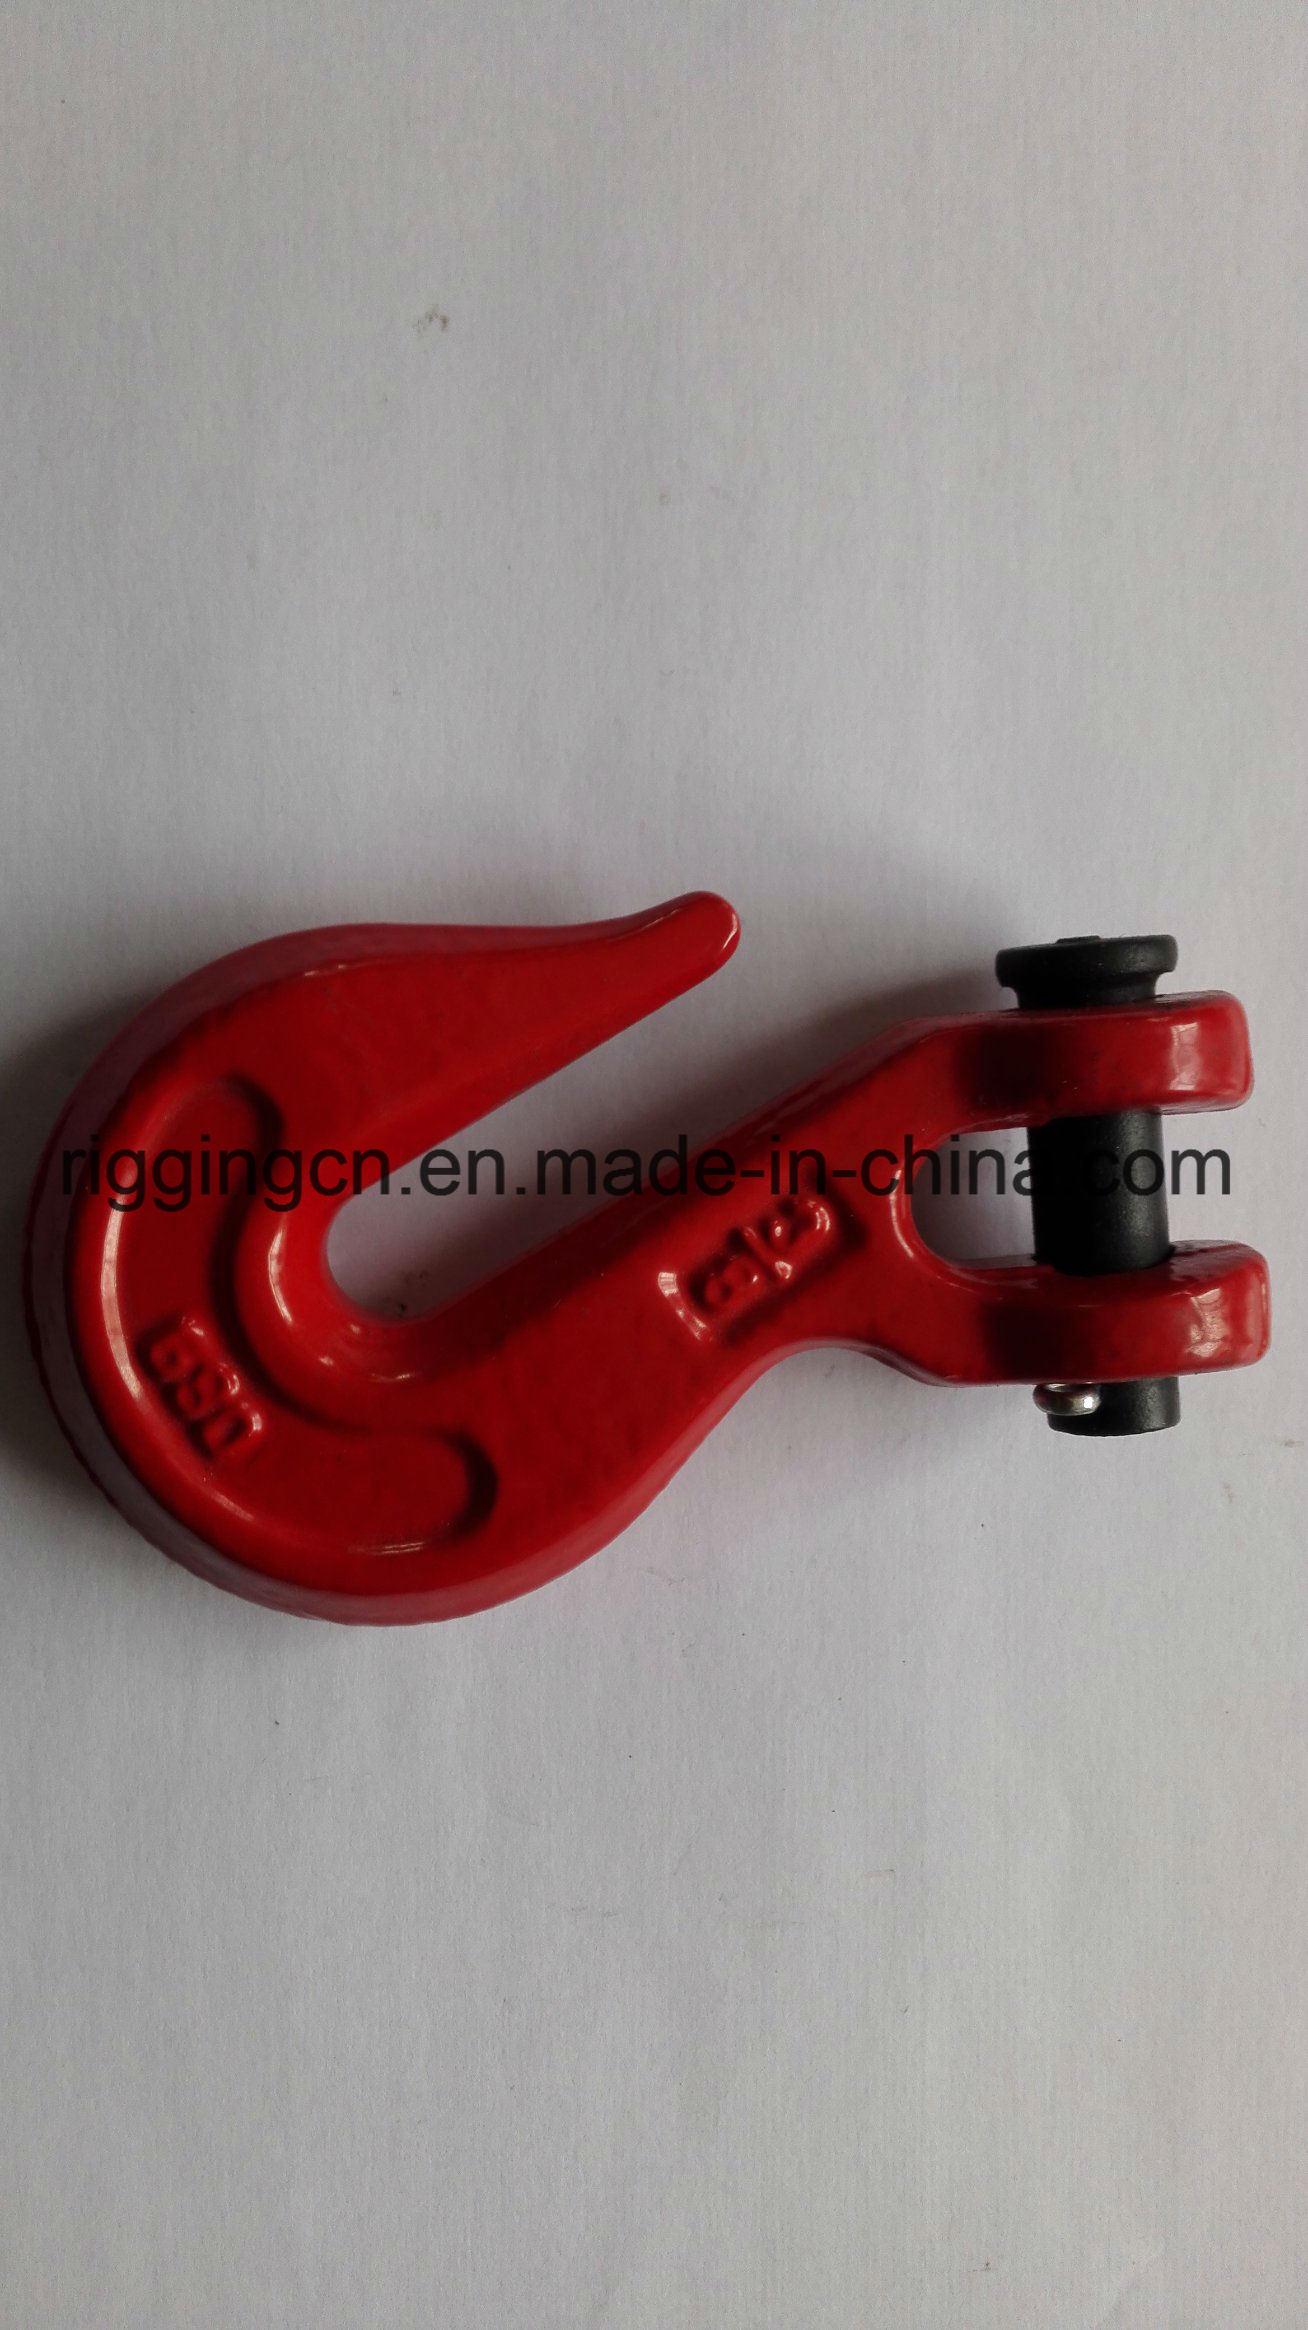 G80 safety Self Lock Eye Hook in European Standerd